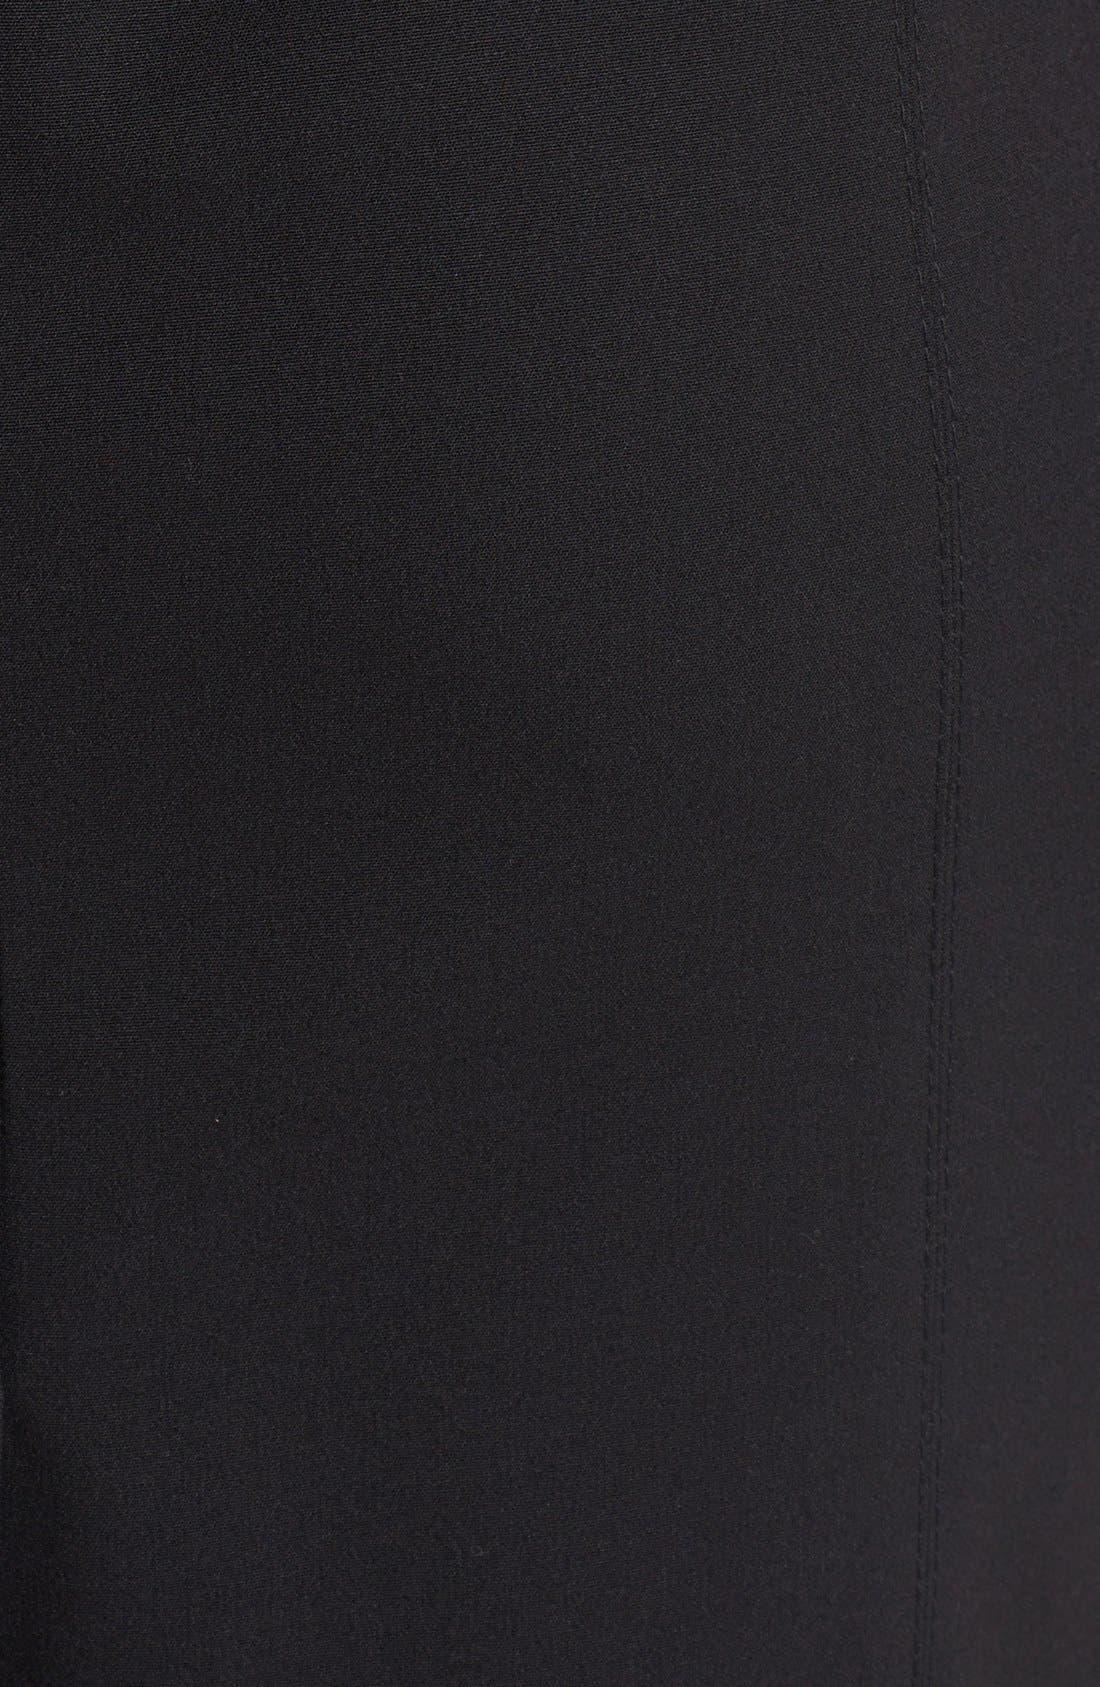 'Mallory' All Season Stretch Sheath Dress,                             Alternate thumbnail 3, color,                             001